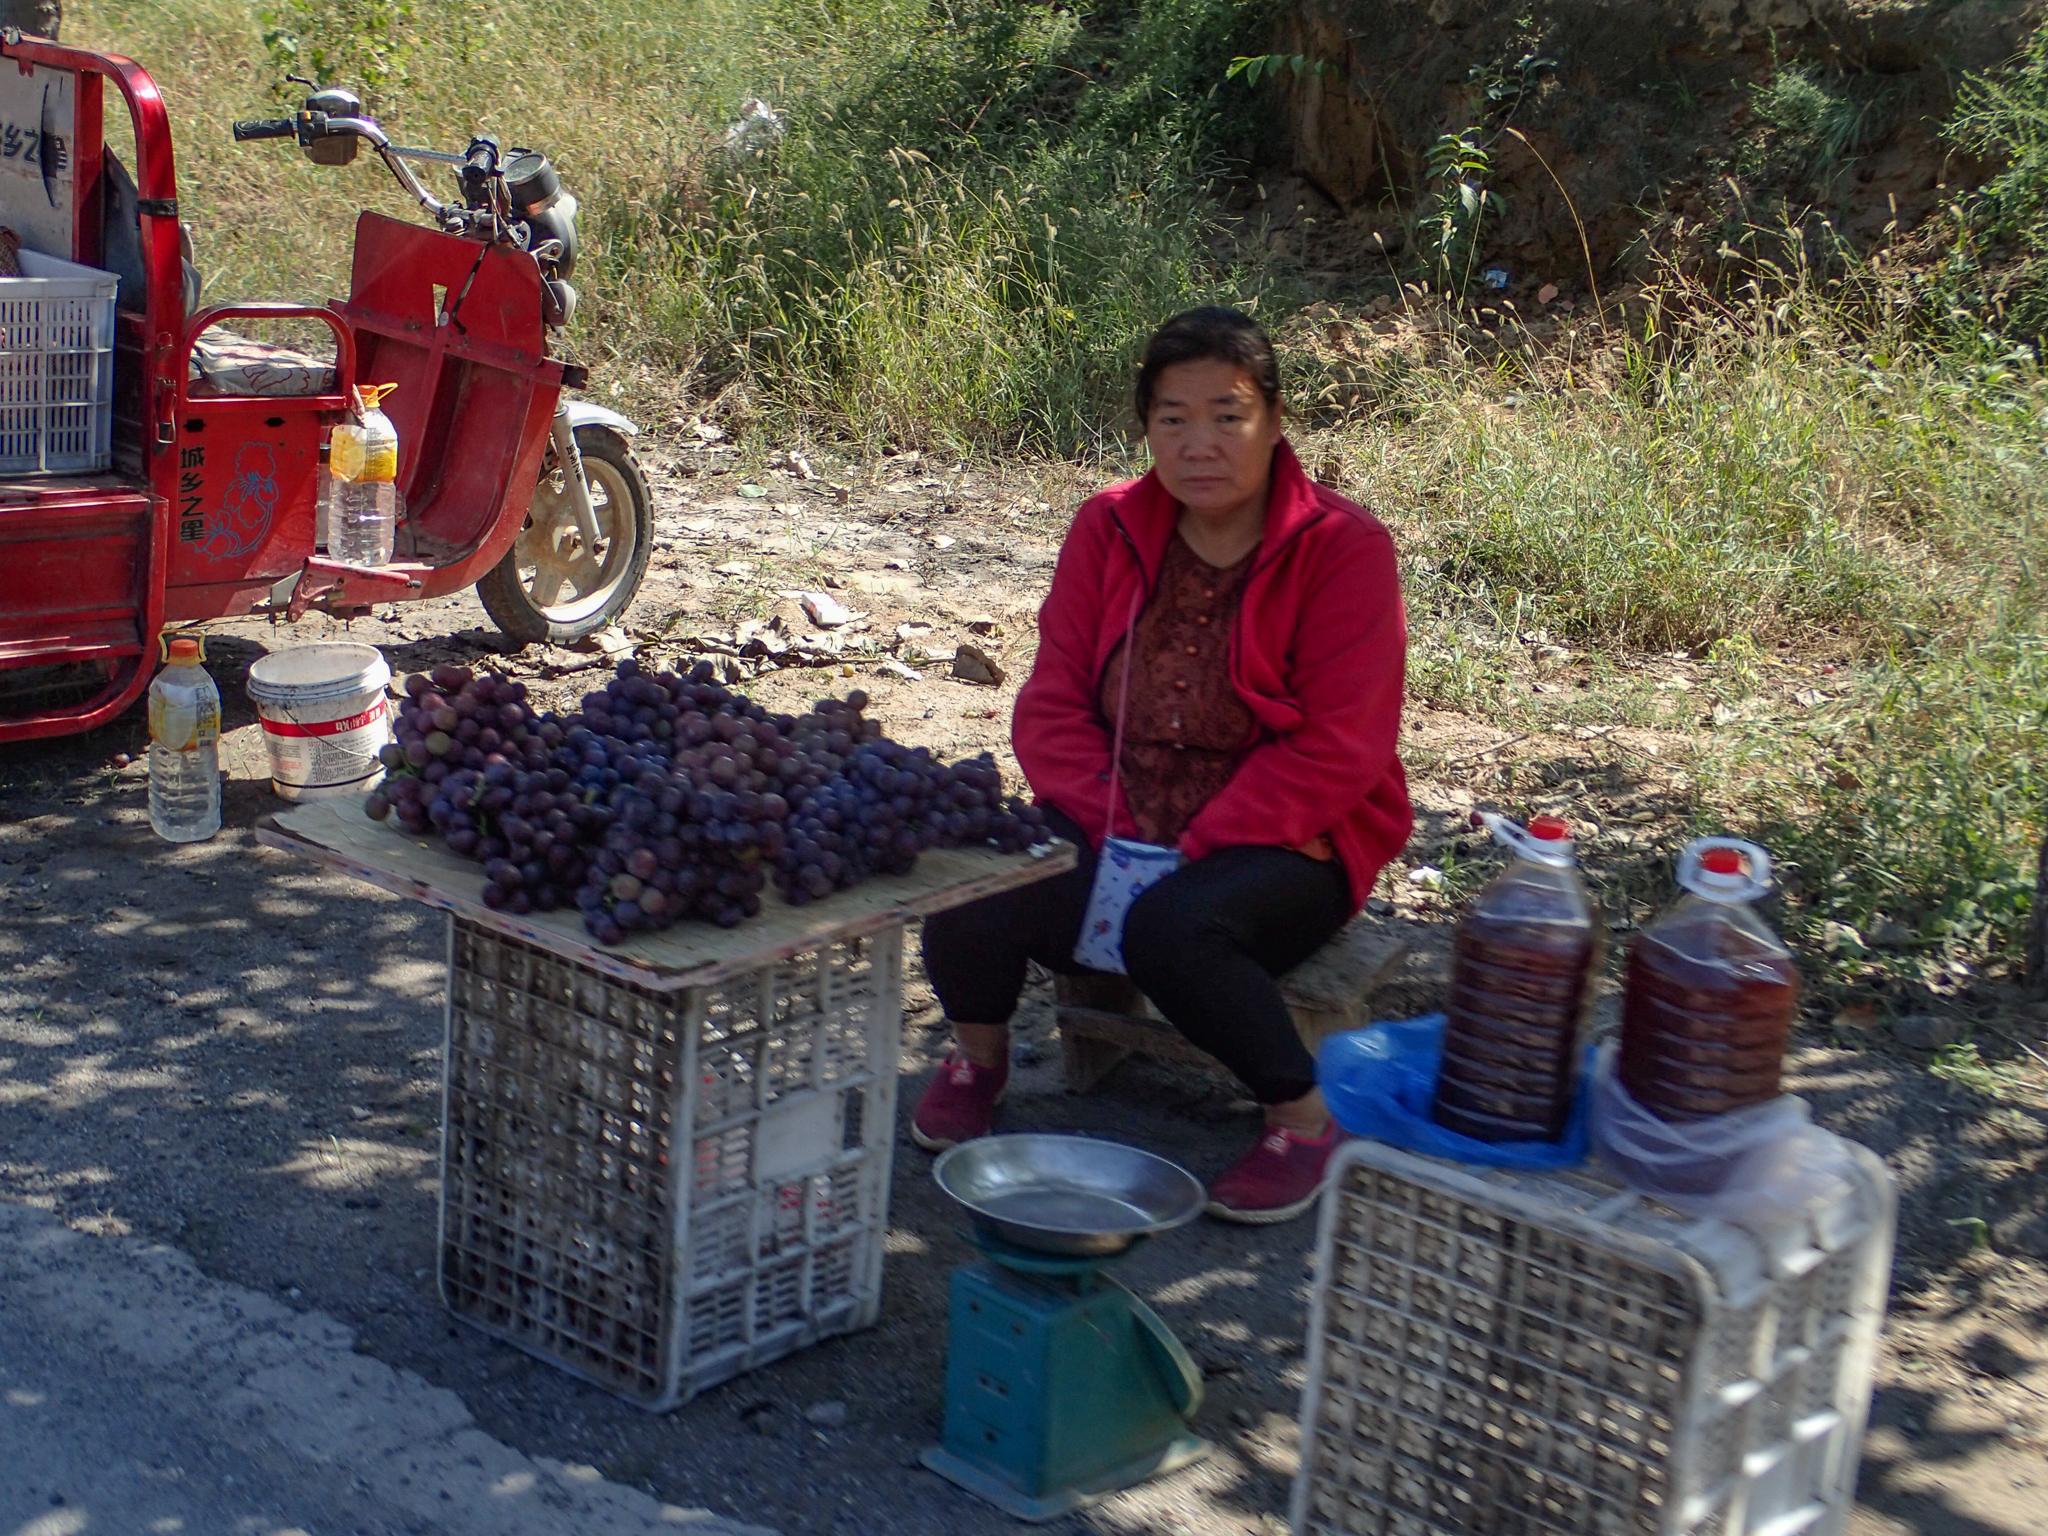 Roadside grapes and grape juice